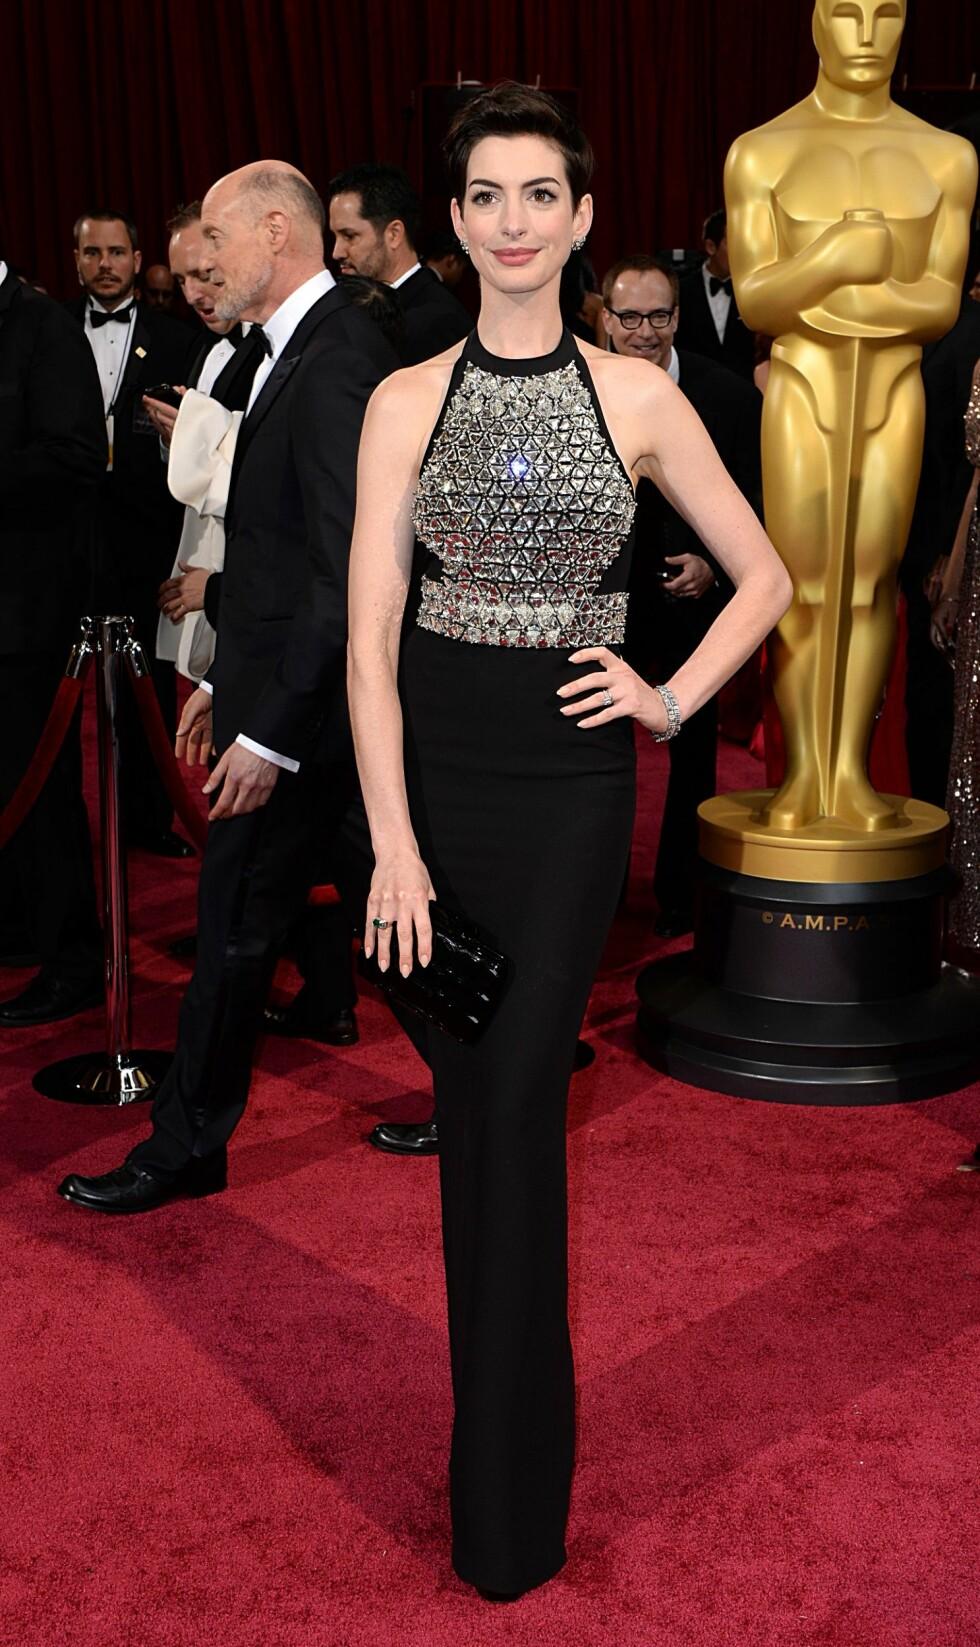 Anne Hathaway i kjole fra Gucci. Foto: All Over Press